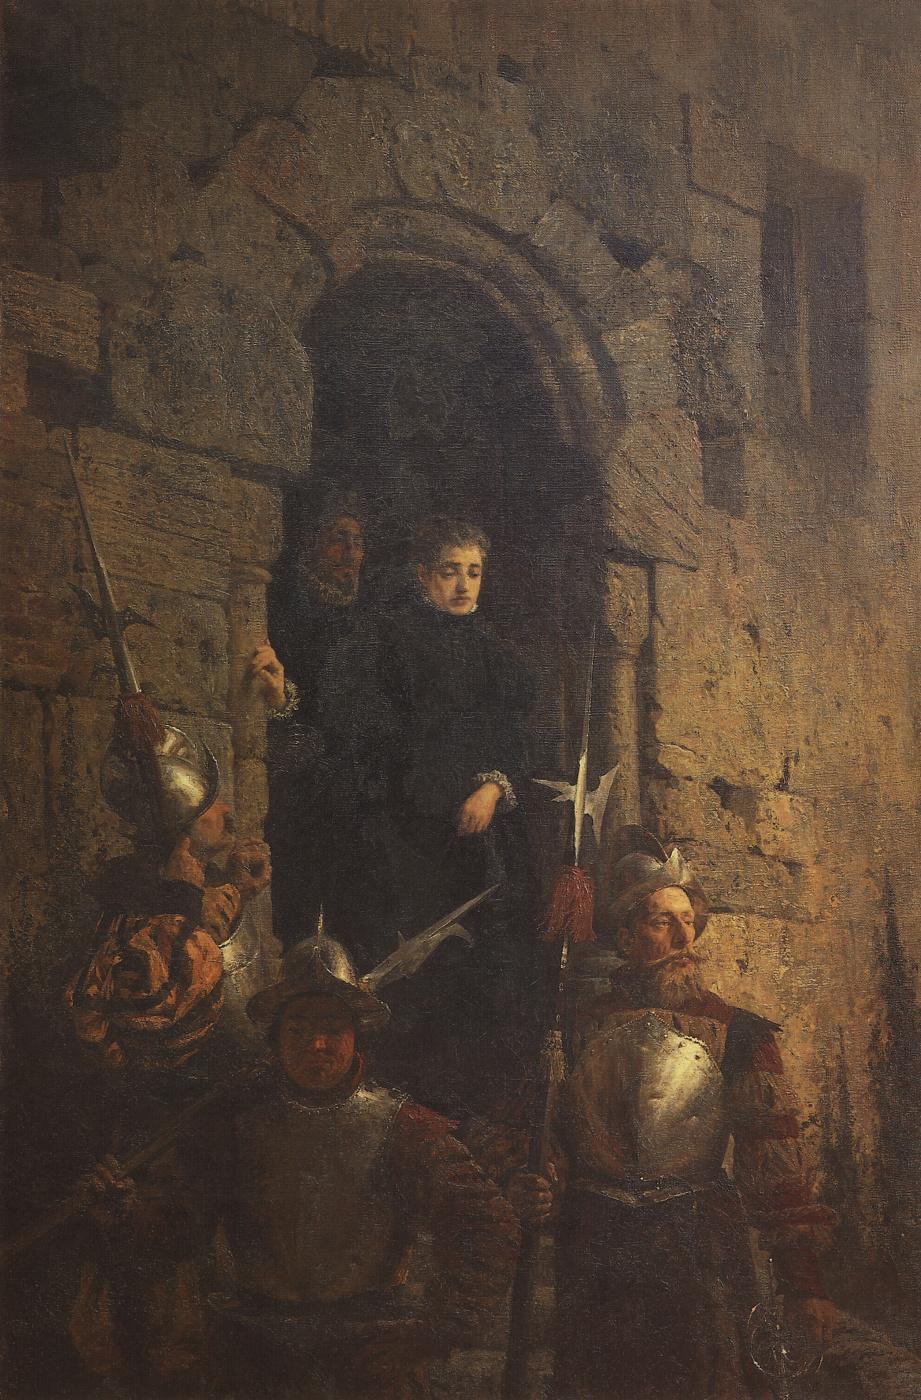 Vasily Dmitrievich Polenov. The arrest of guenadi Jacobin de Montbel, Countess d Acreman